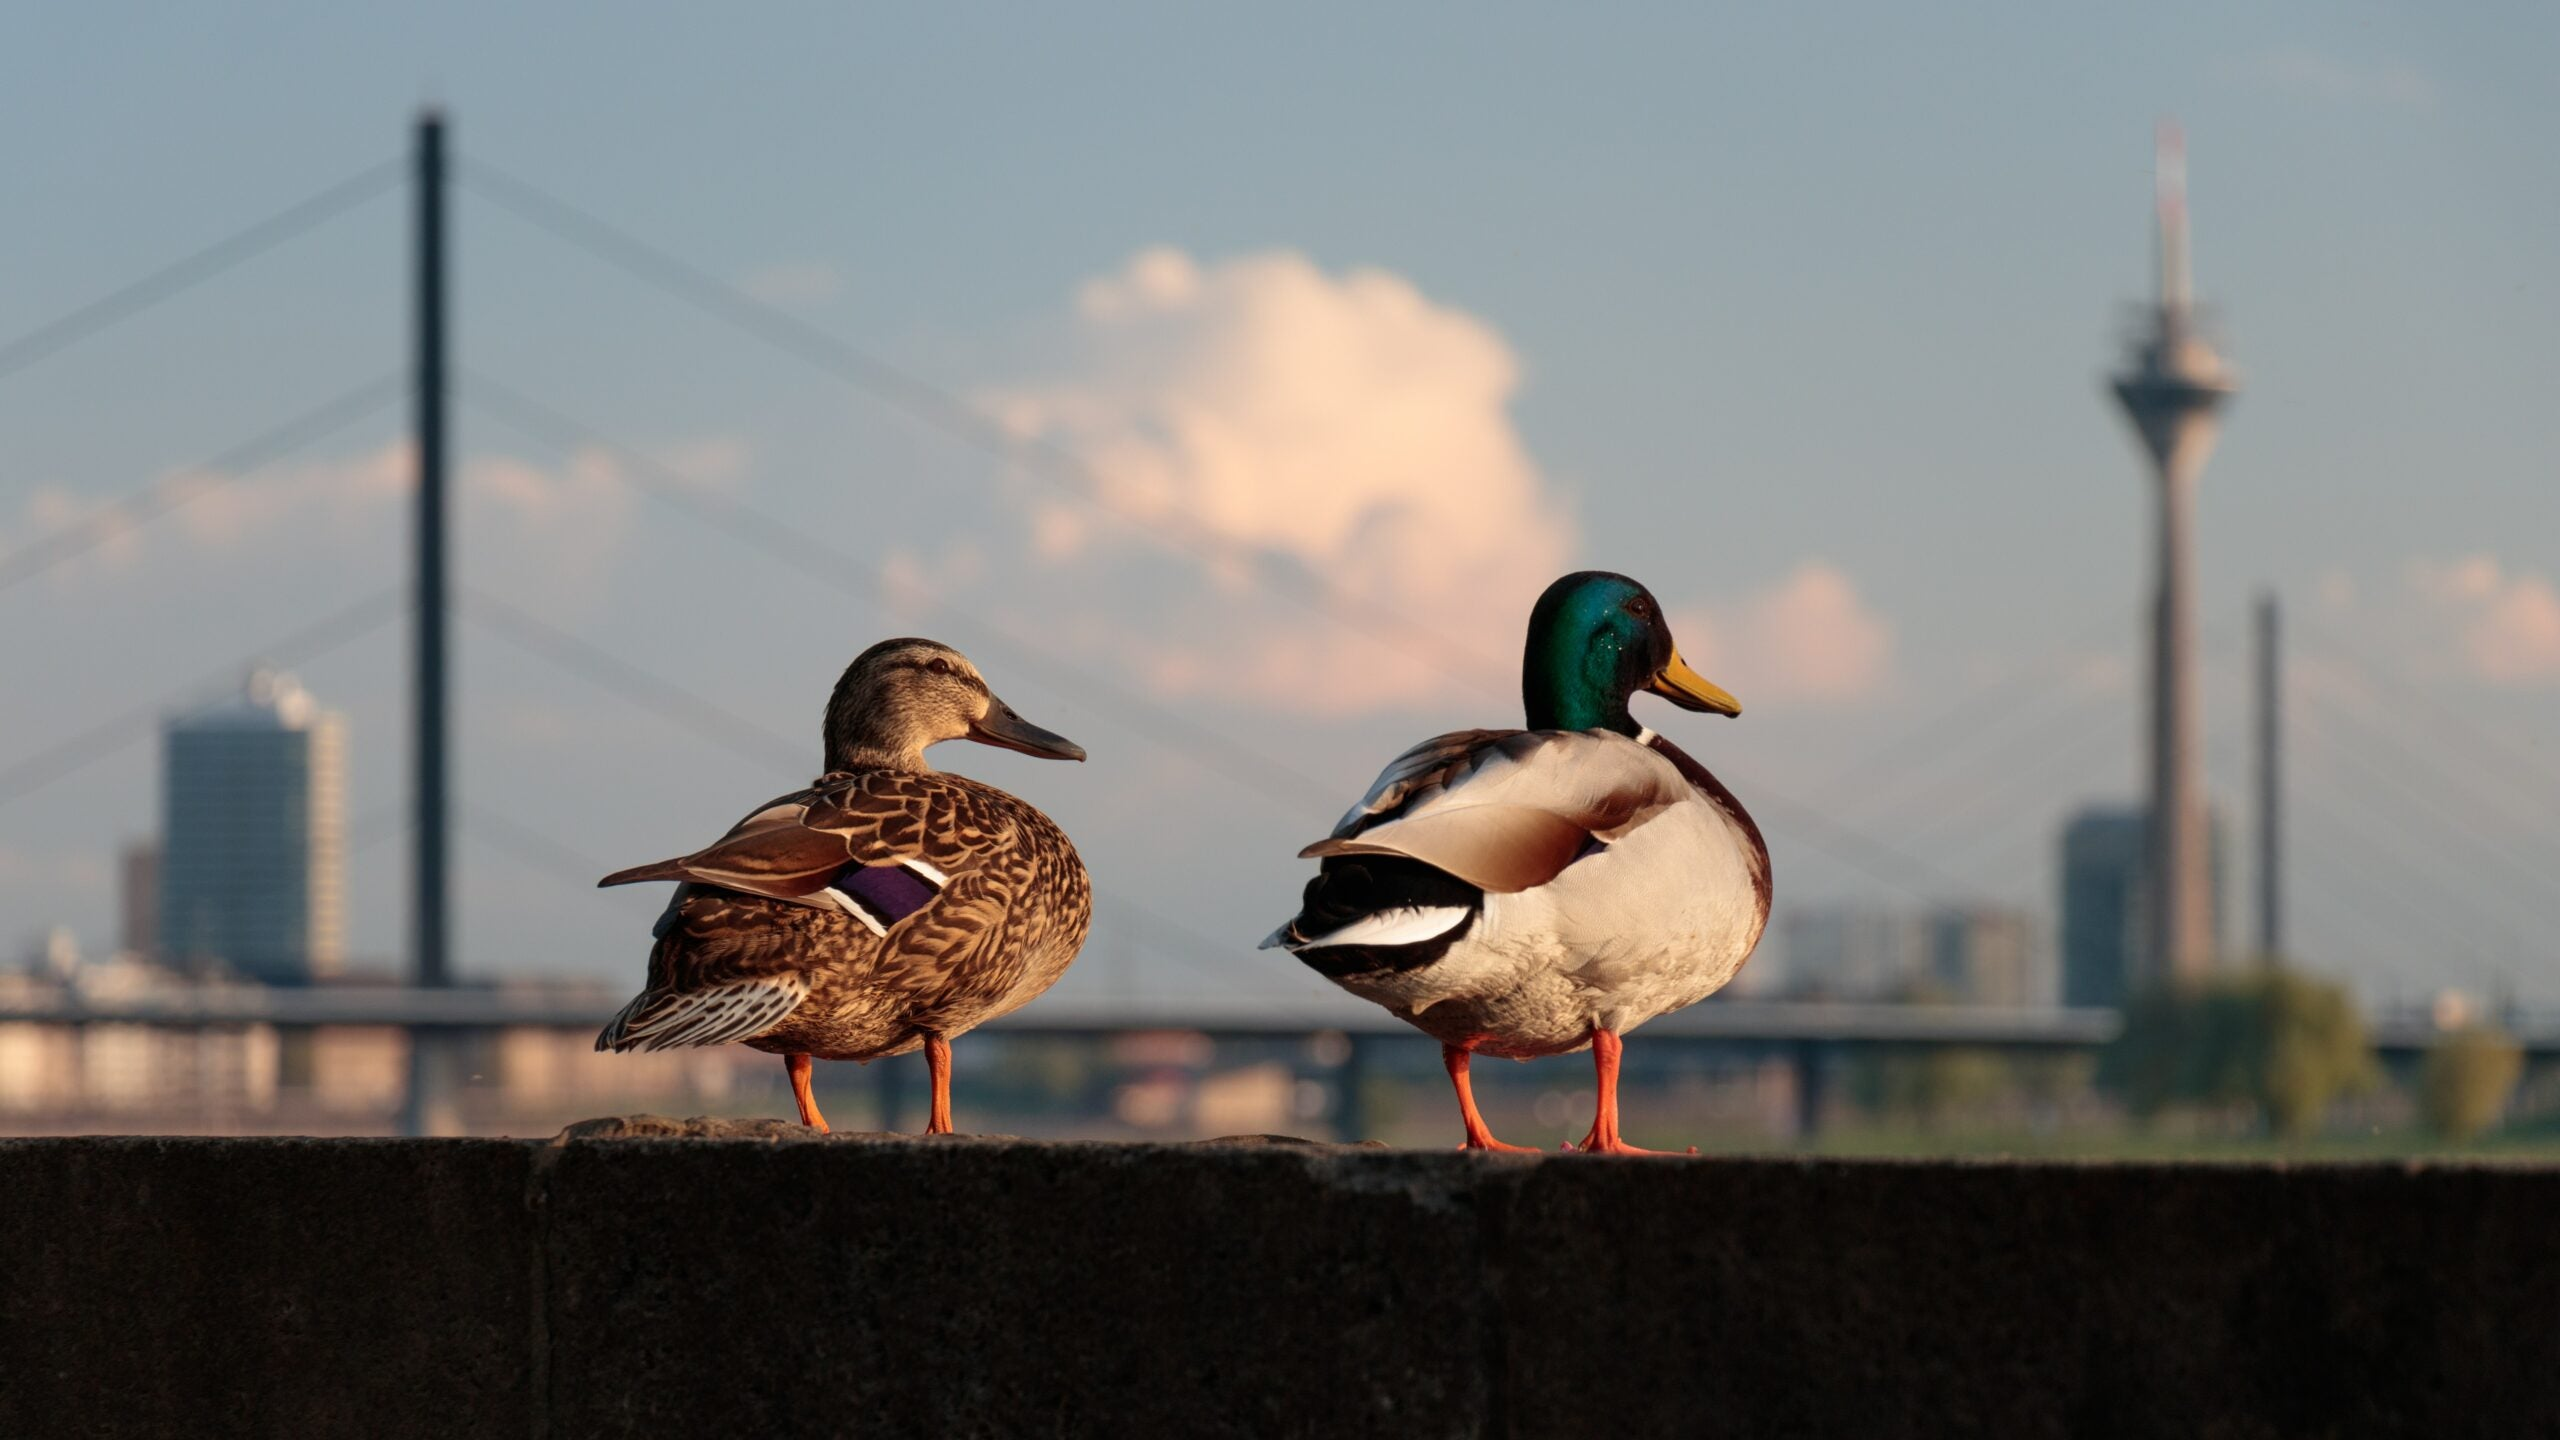 A mallard hen and drake perched on a concrete embankment near a city.